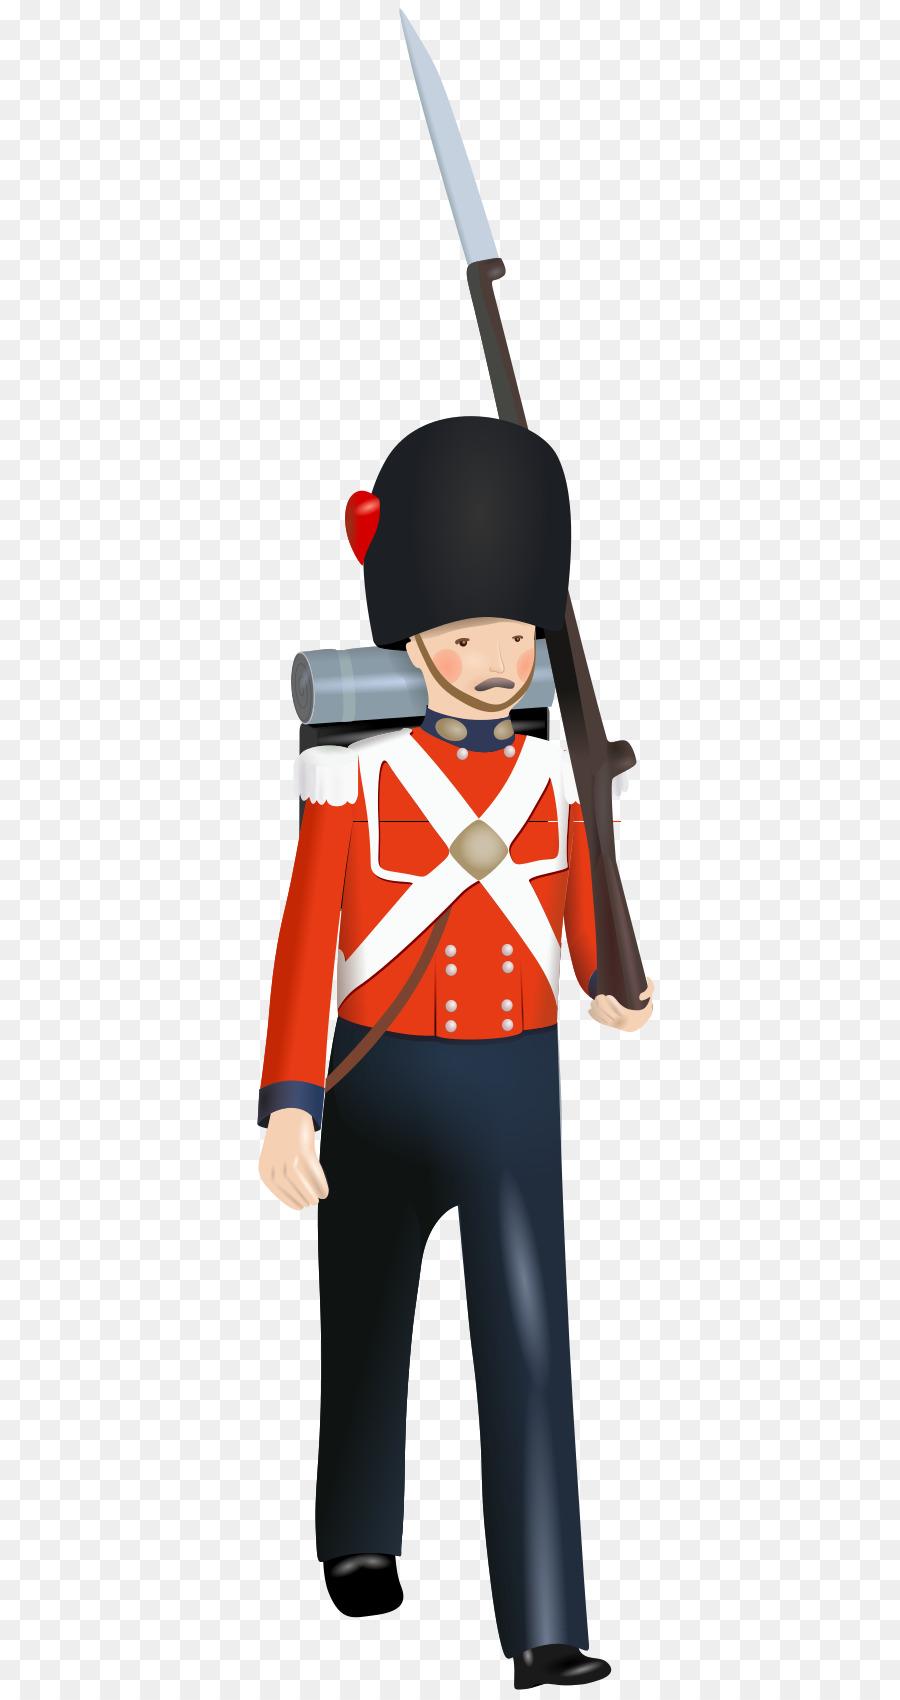 Soldier Cartoon clipart.